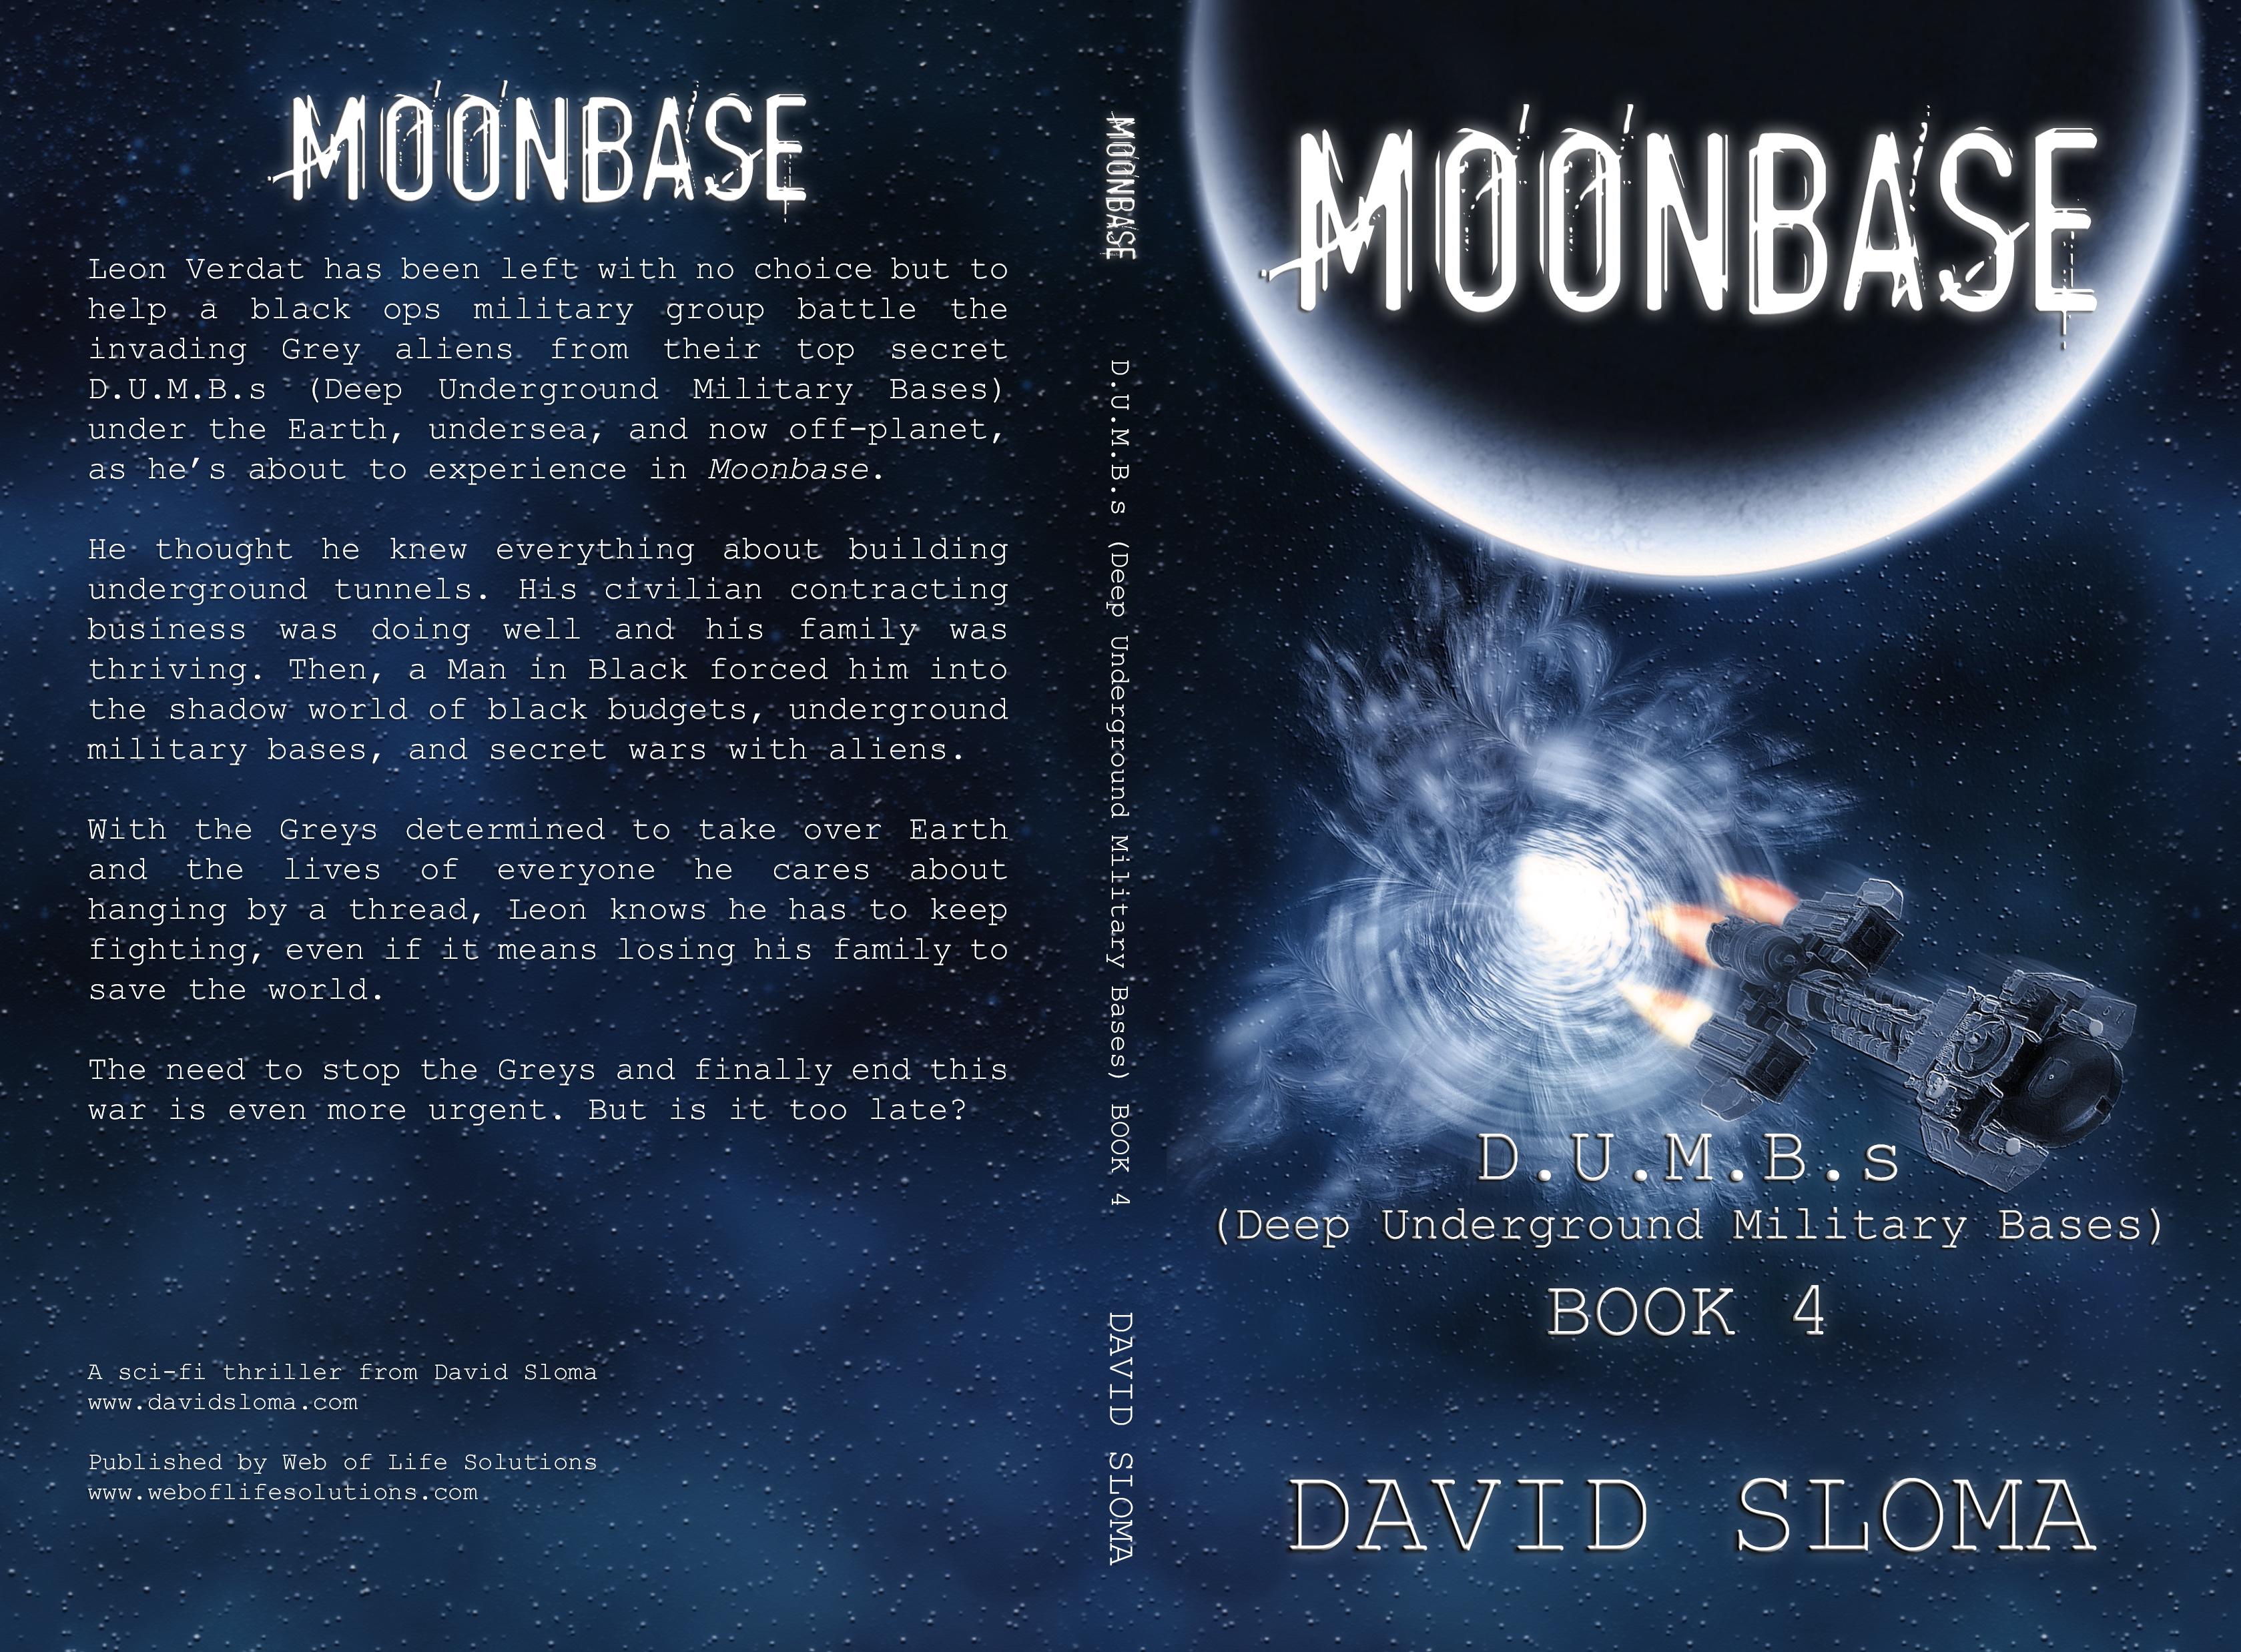 Moonbase_pRINT